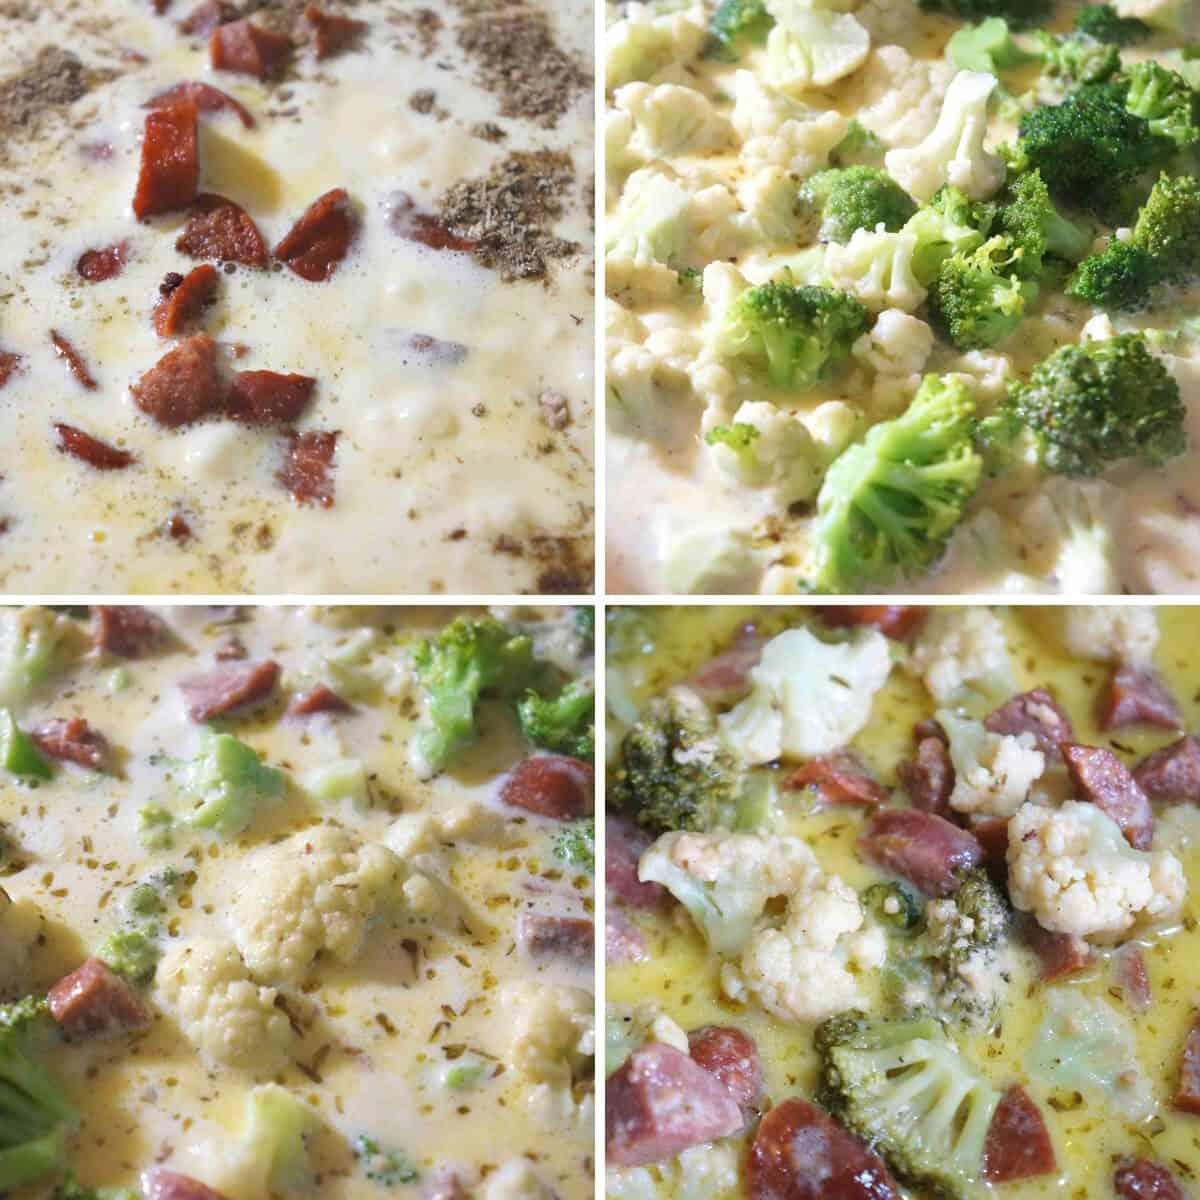 final steps to make cauliflower cheese soup